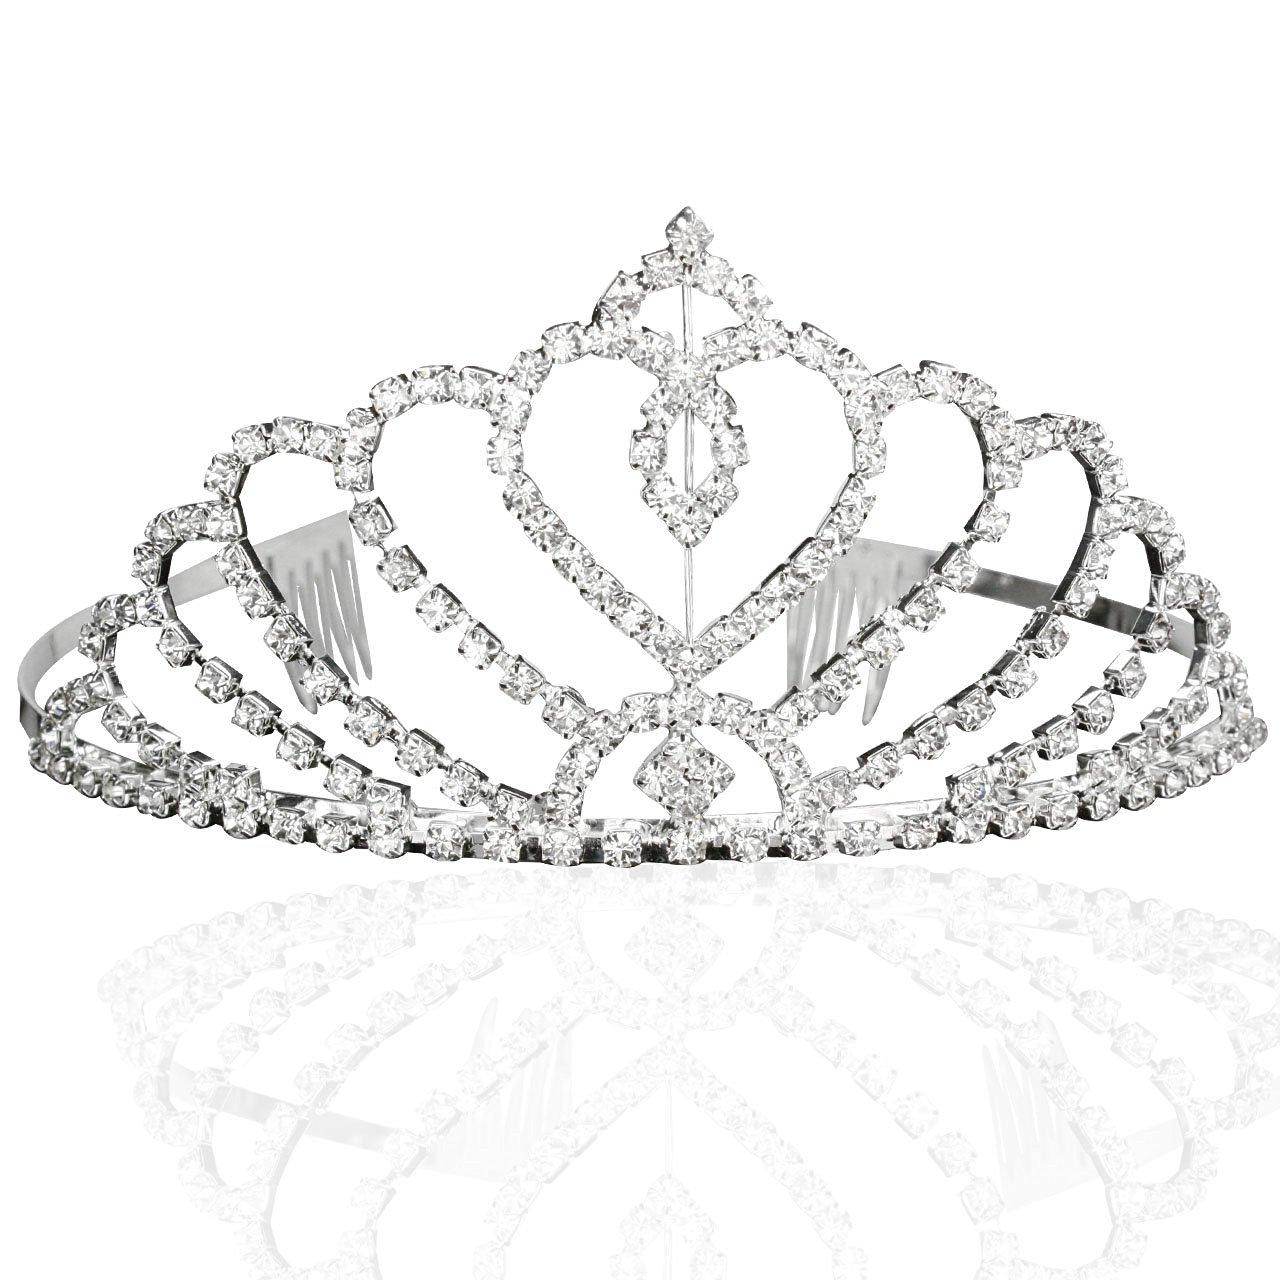 Buy Bridal Wedding Princess Tiara Crown With Blooming